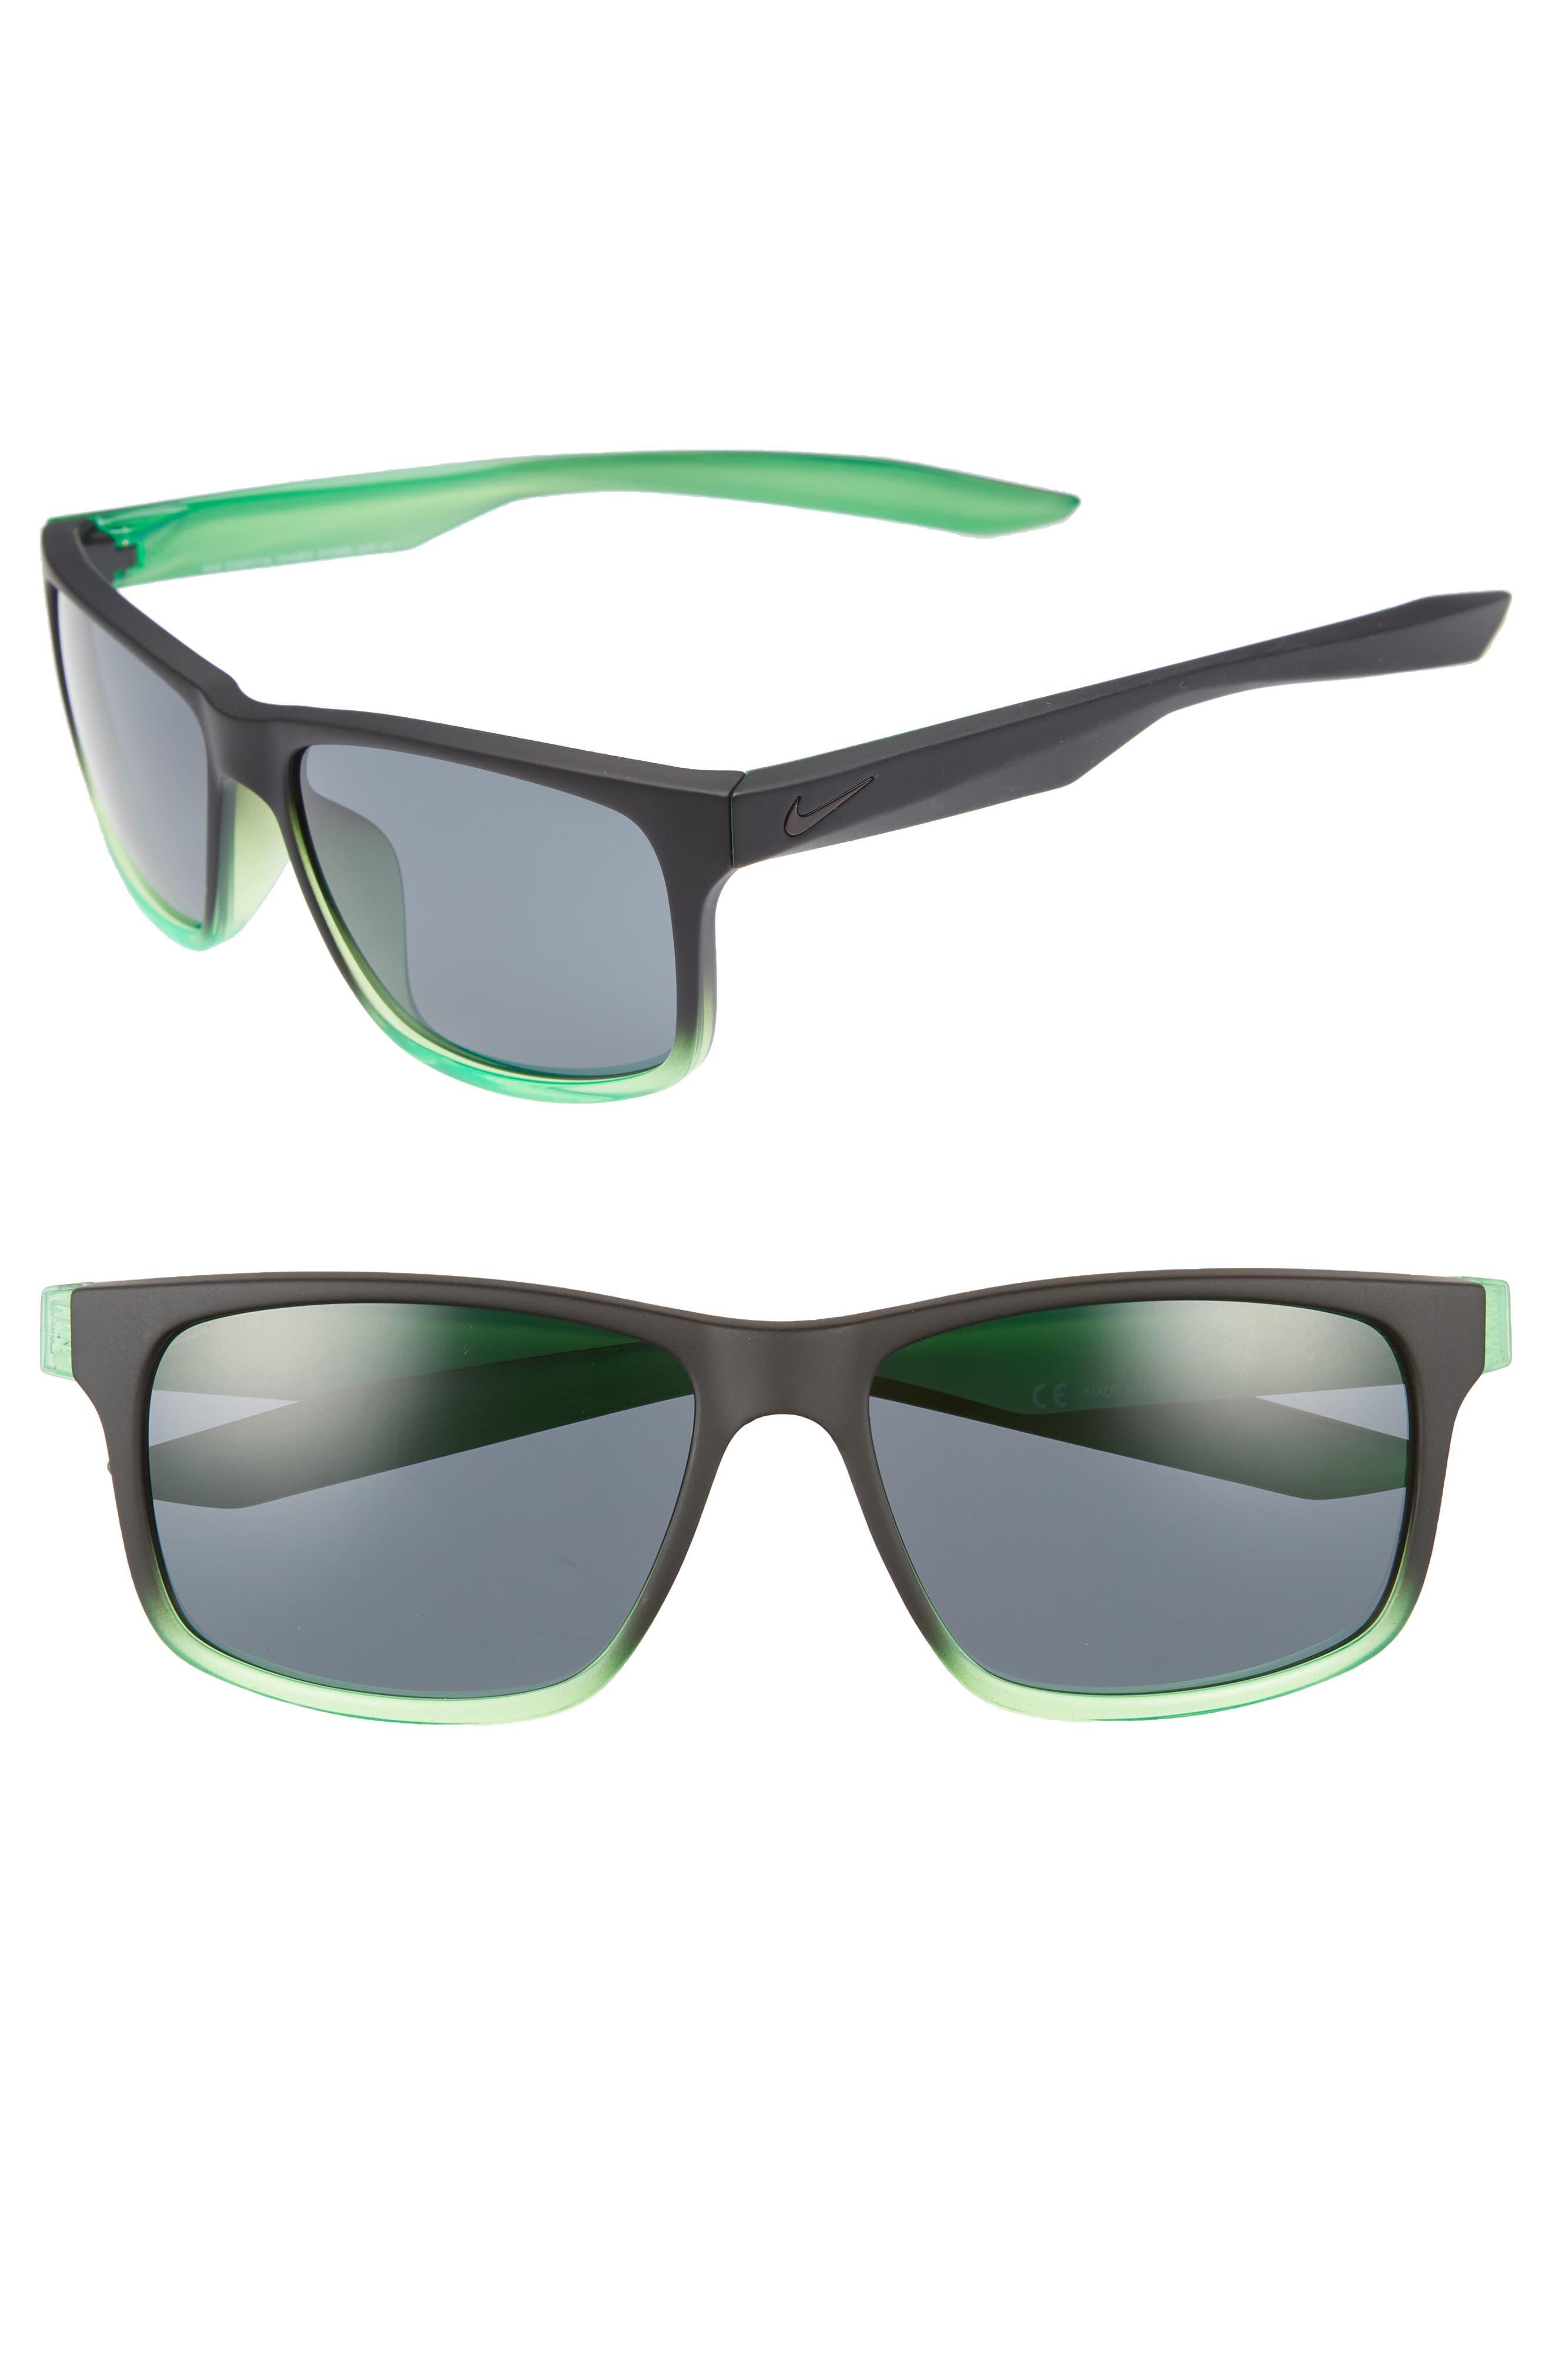 Essential Chaser 56mm Sunglasses,                             Main thumbnail 1, color,                             Matte Black Green/ Dark Grey